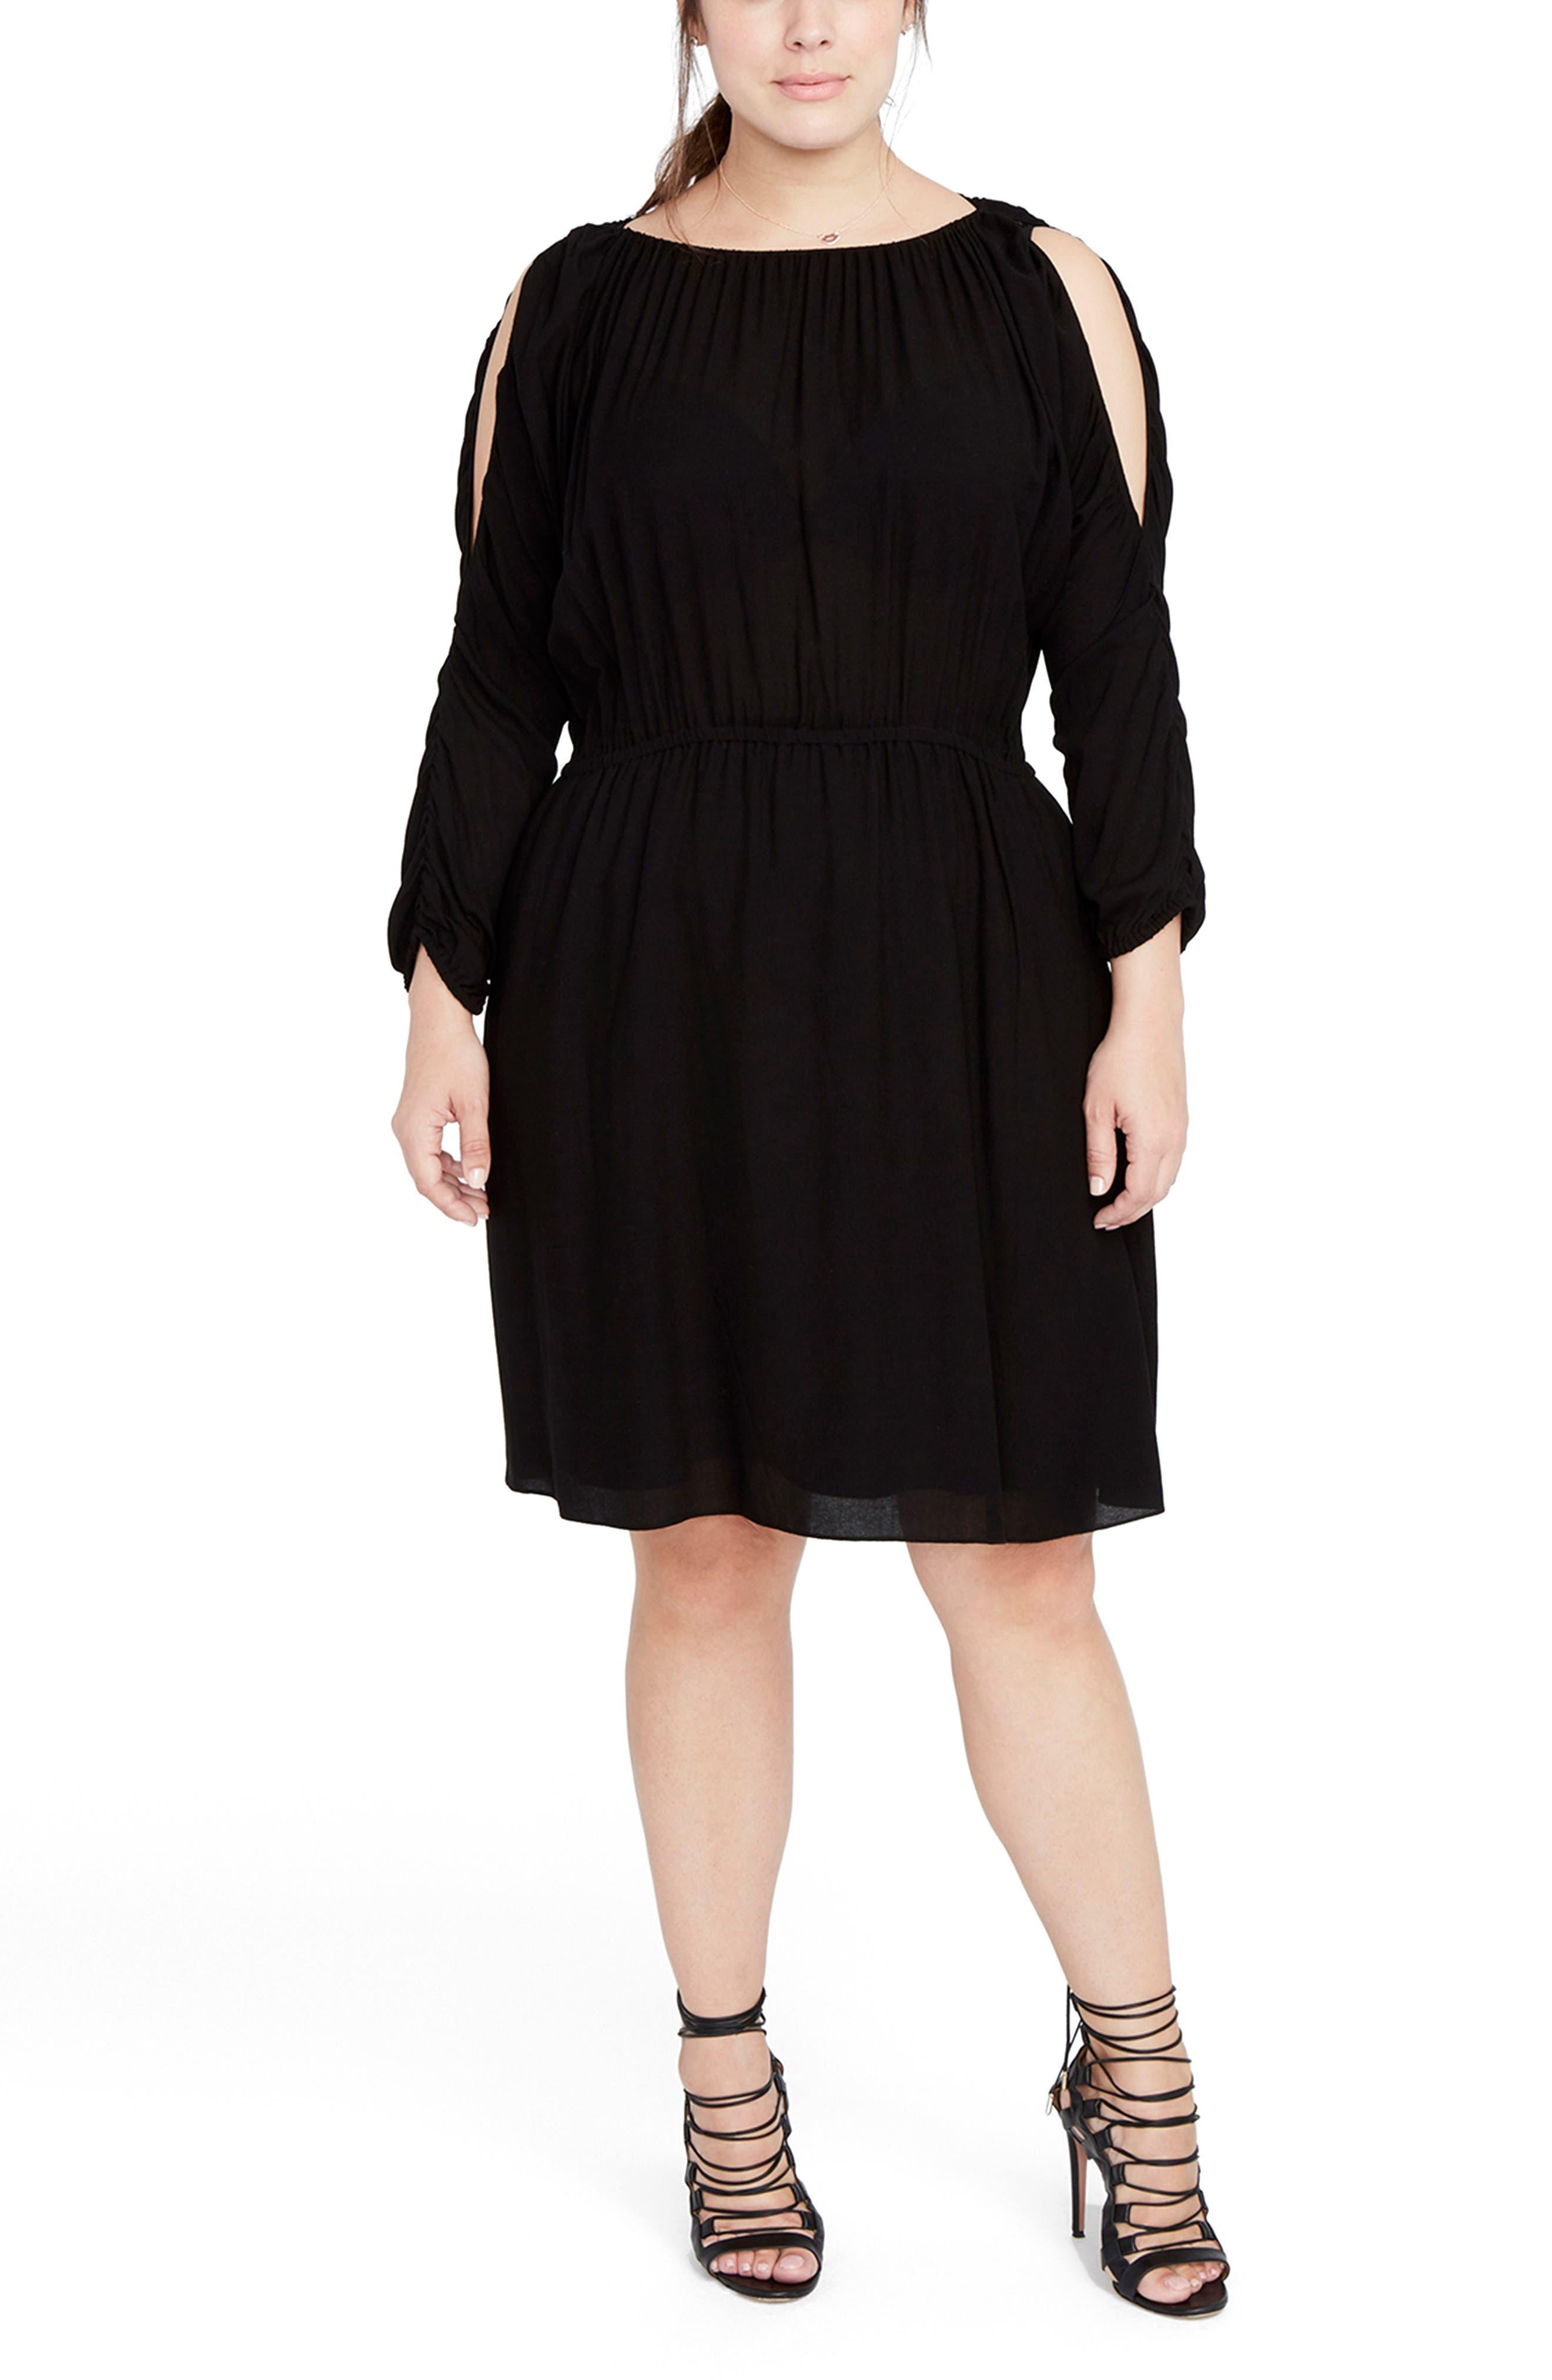 Ruched Cold Shoulder Dress,                             Main thumbnail 1, color,                             Black